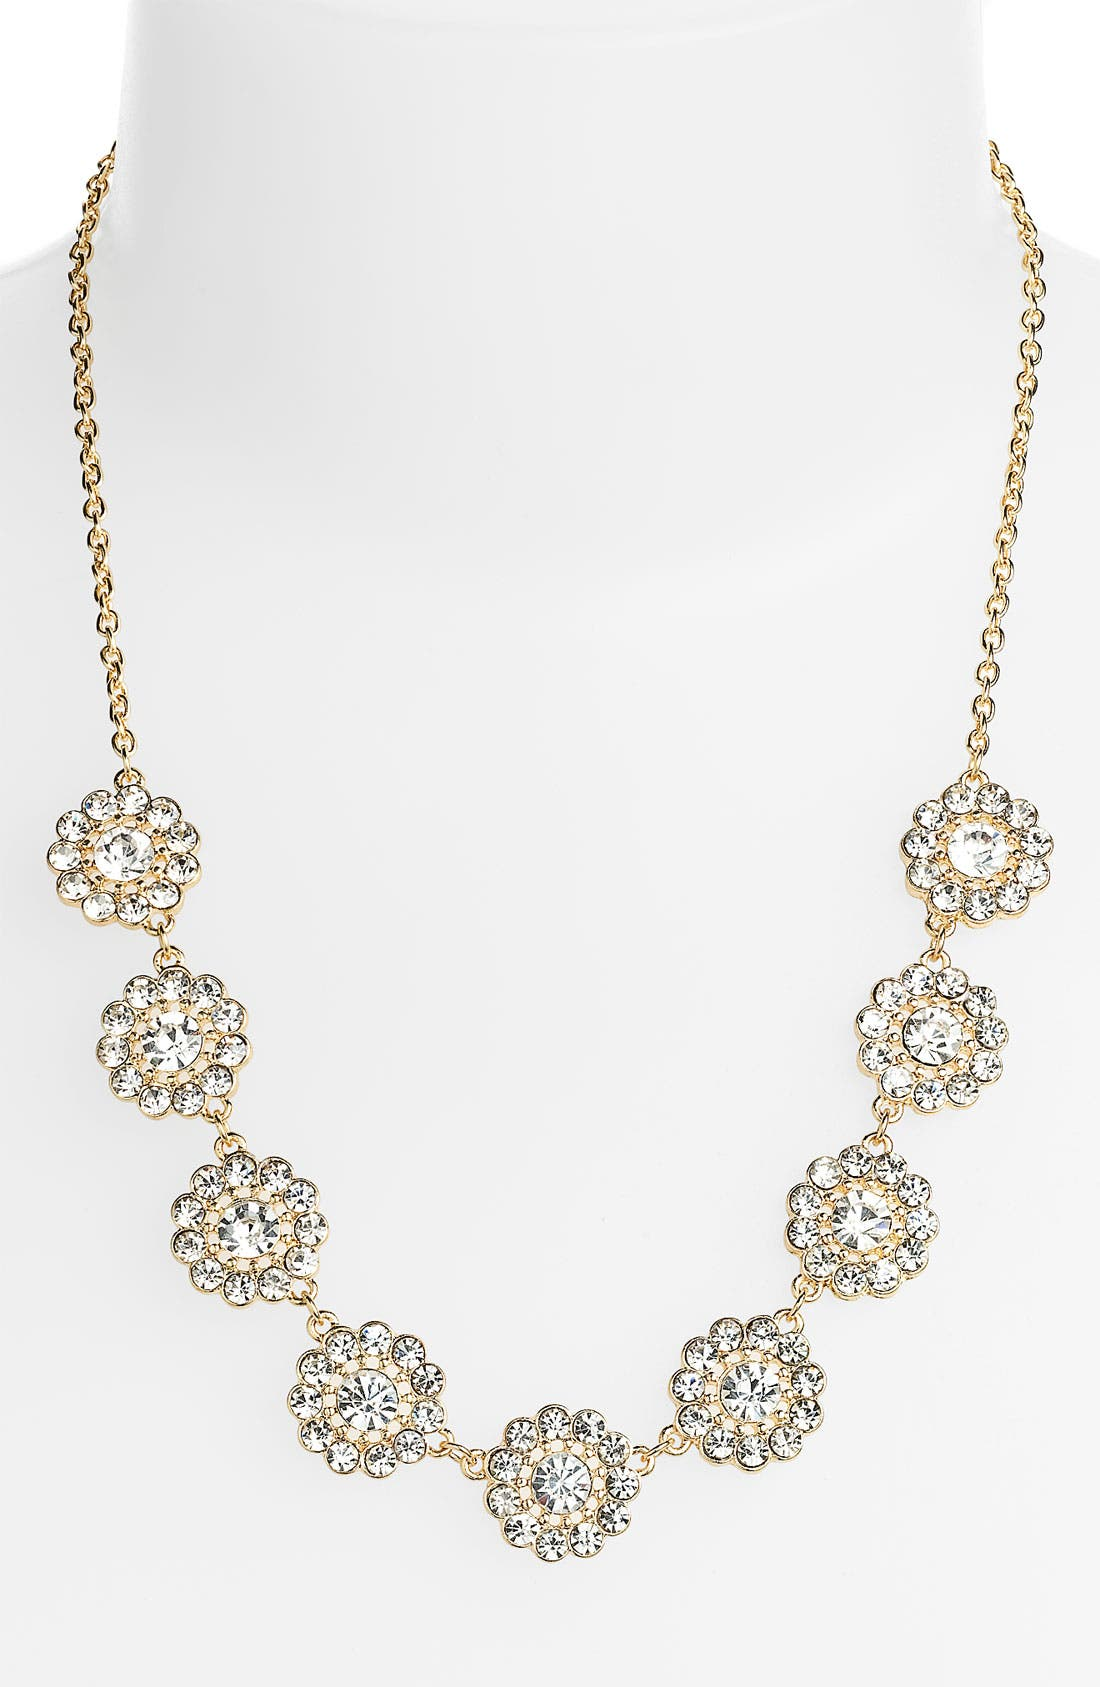 Main Image - Carole Floral Rhinestone Necklace